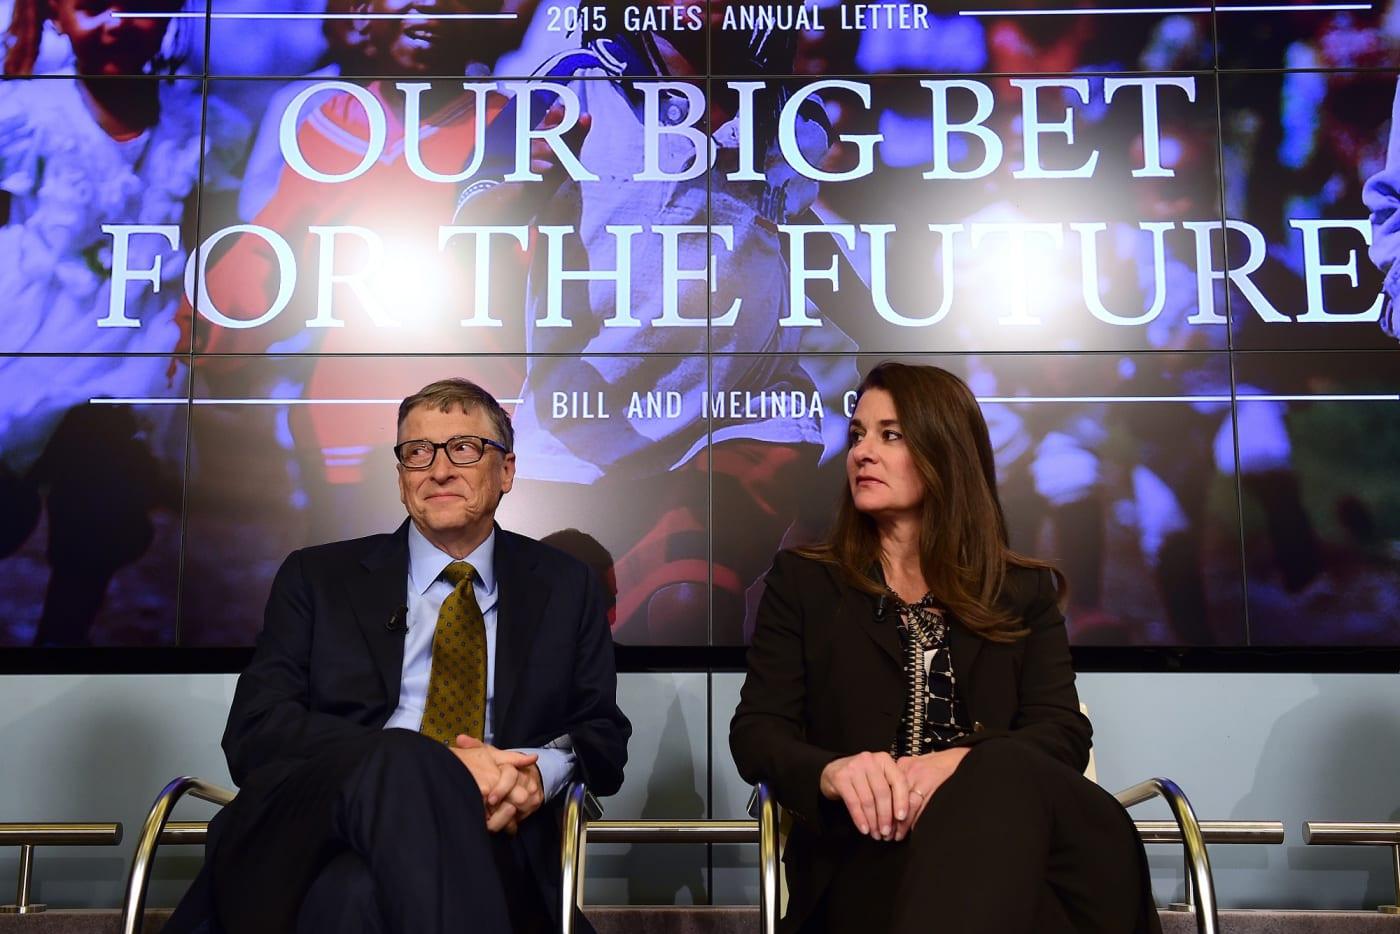 Bil i Melinda Gejts tokom godišnjeg obraćanja javnosti 2015. godine (Foto: EMMANUEL DUNAND/AFP/Getty Images)